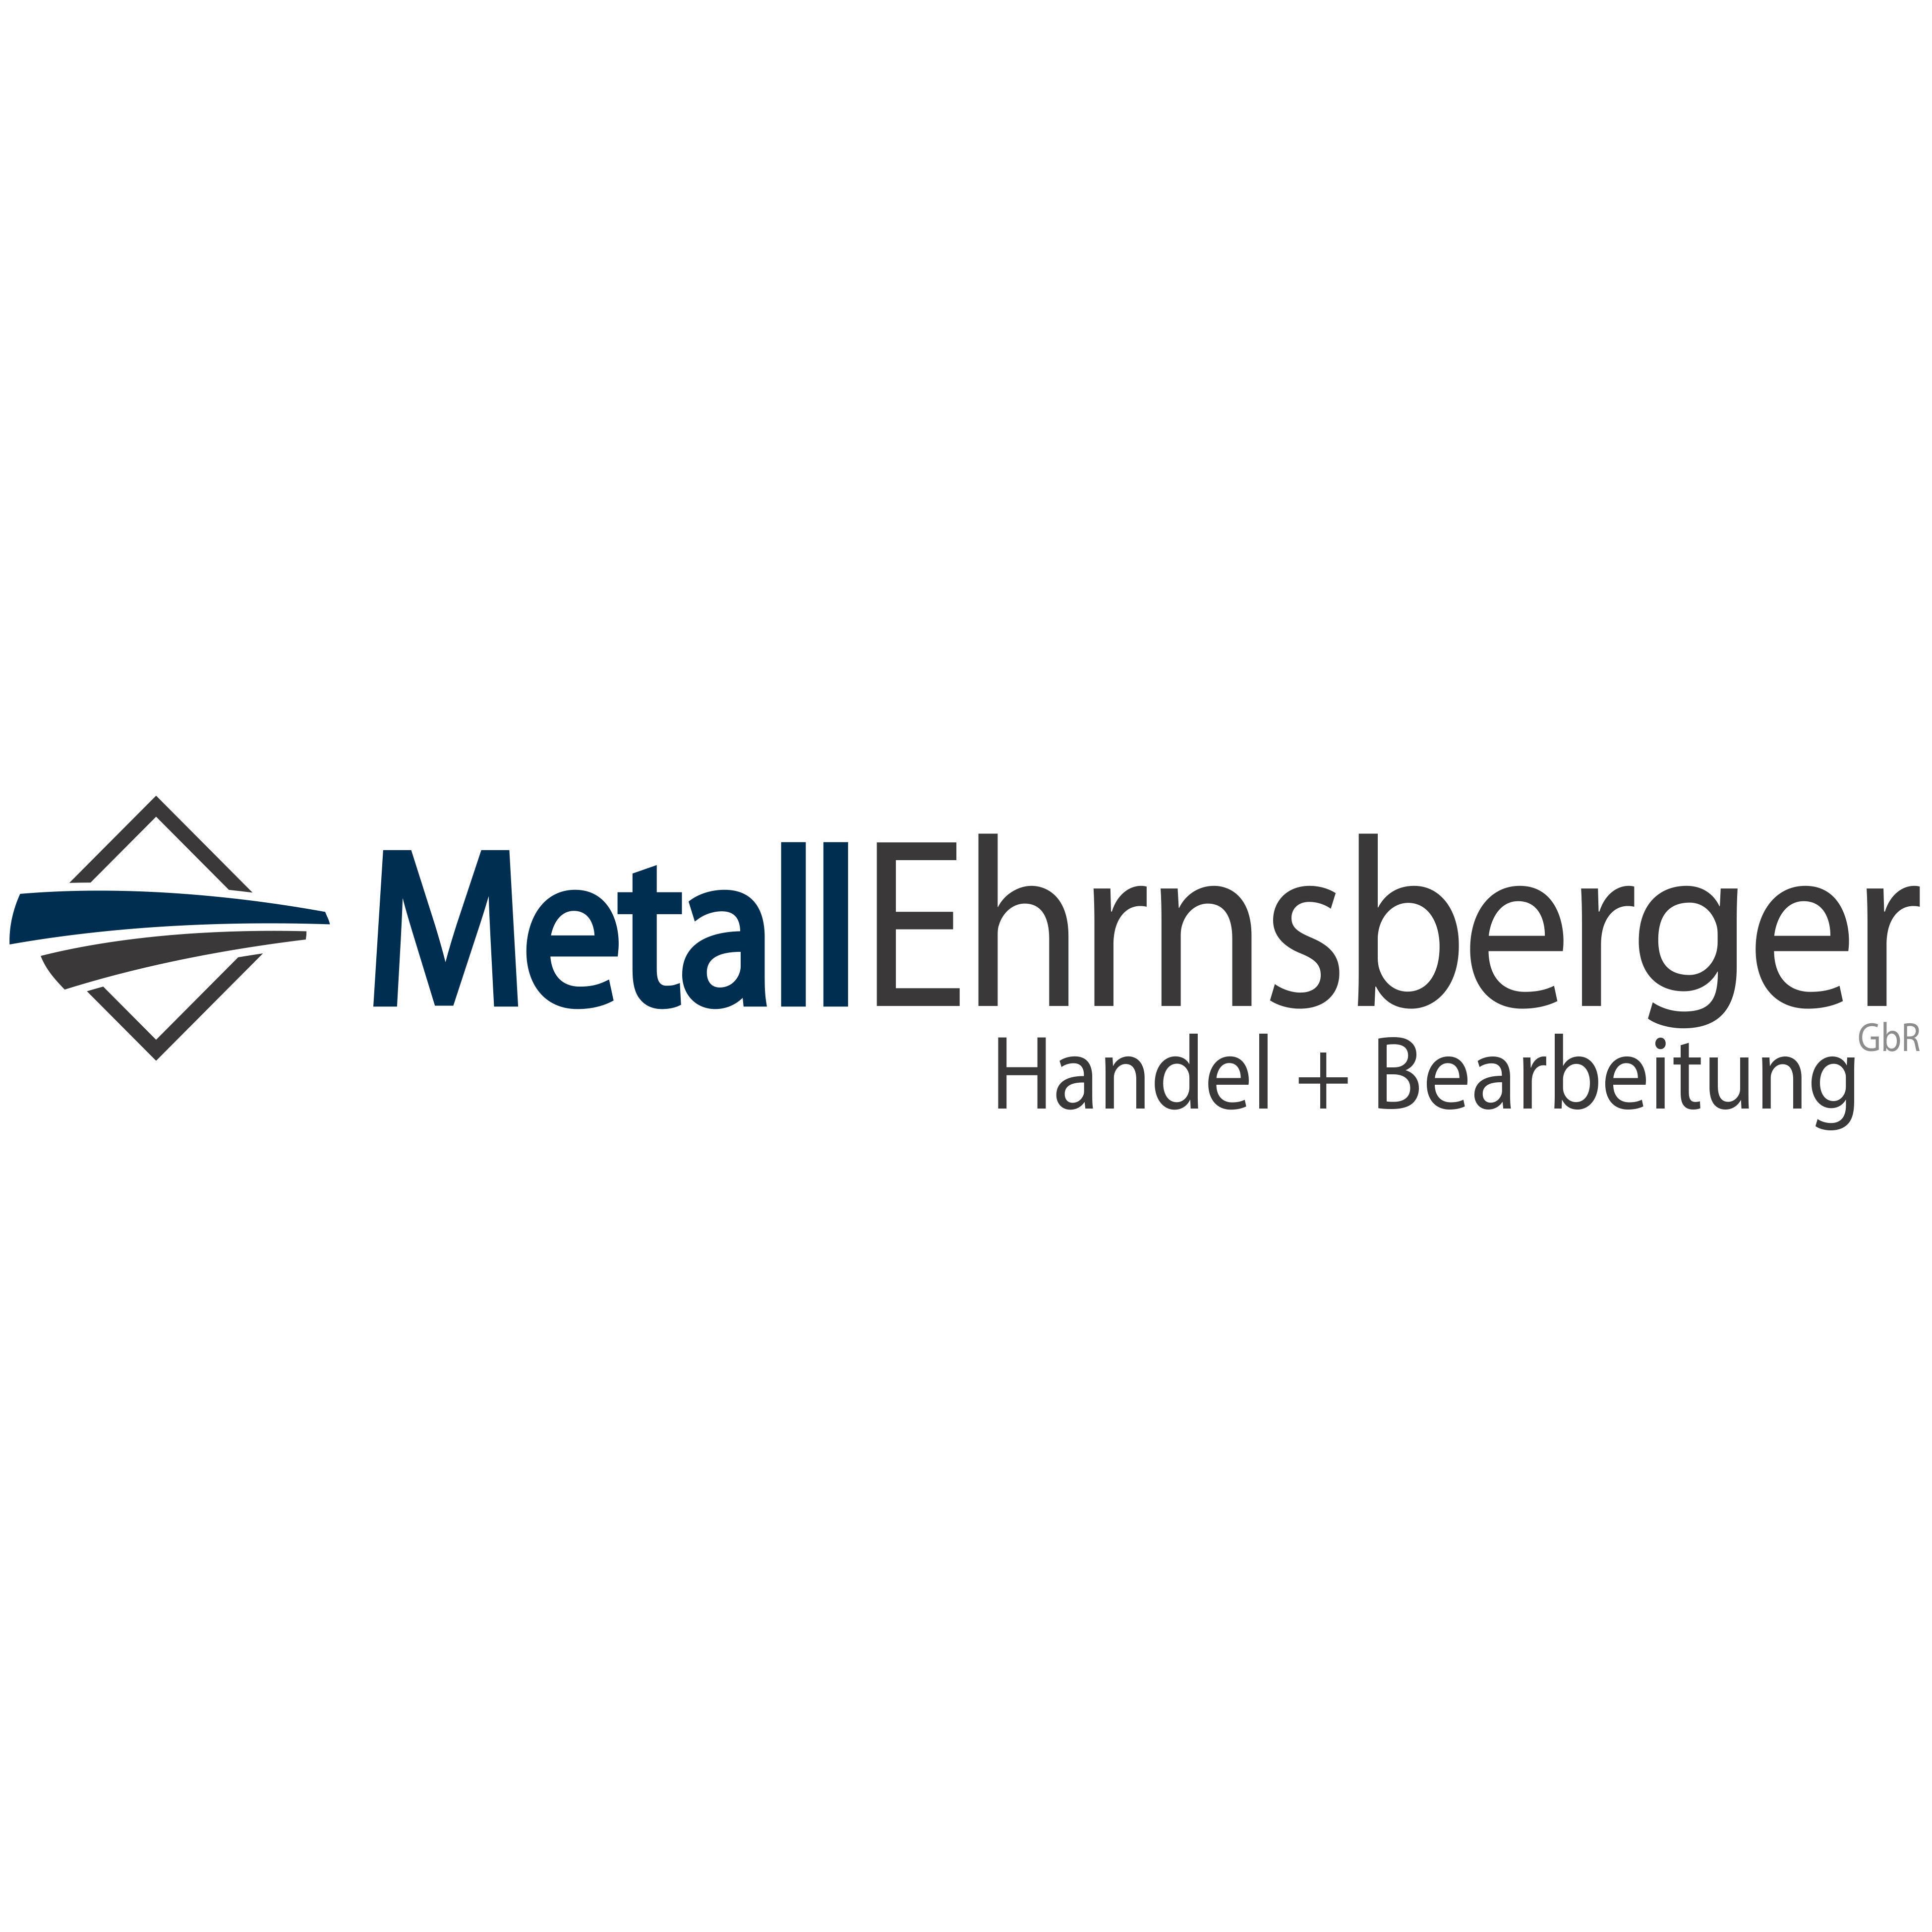 Bild zu Metall Ehrnsberger GbR in Teublitz